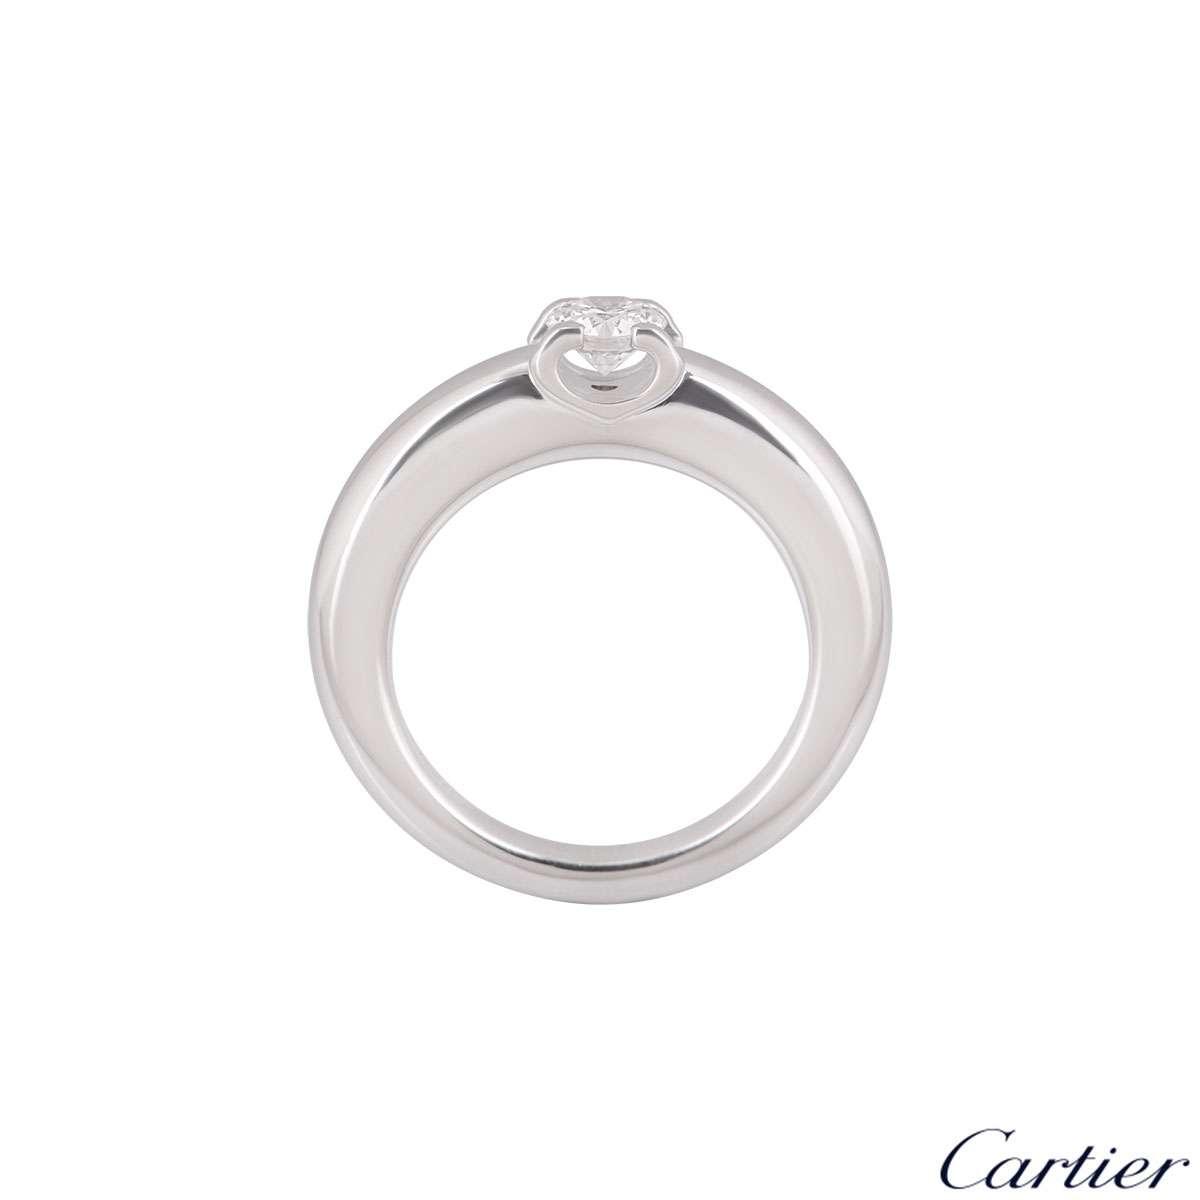 Cartier 18k White Gold Diamond C De Cartier Ring Size 48